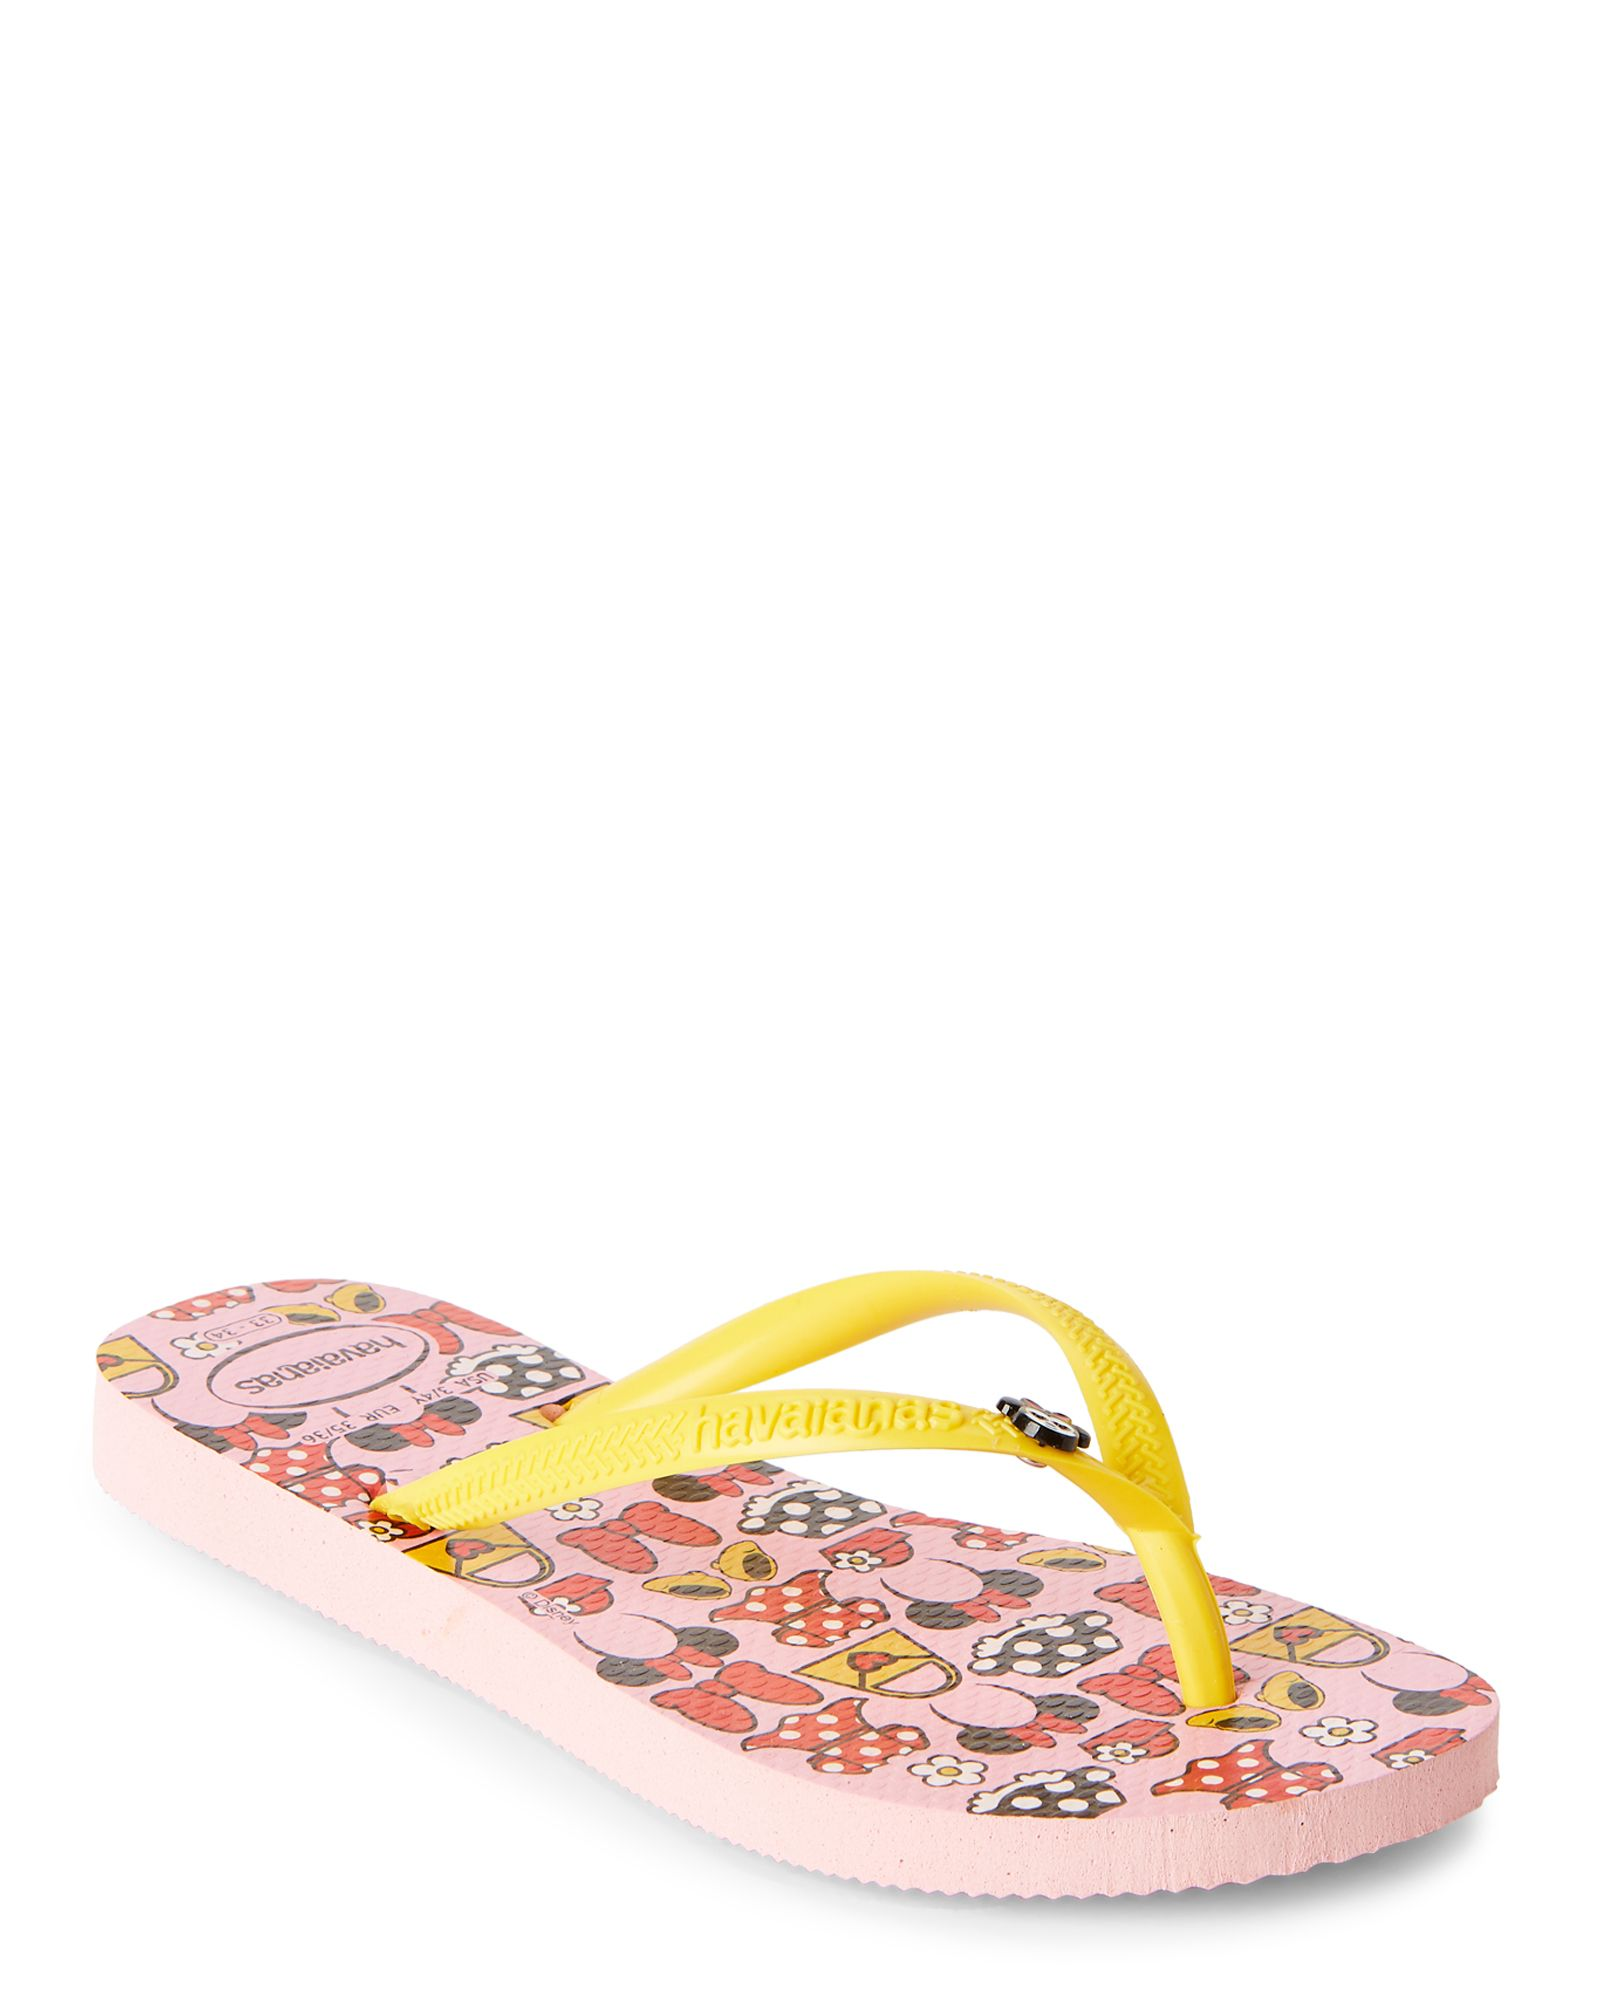 d9aa3acd7 Havaianas (Toddler Kids Girls) Slim Disney Cool Flip Flops ...